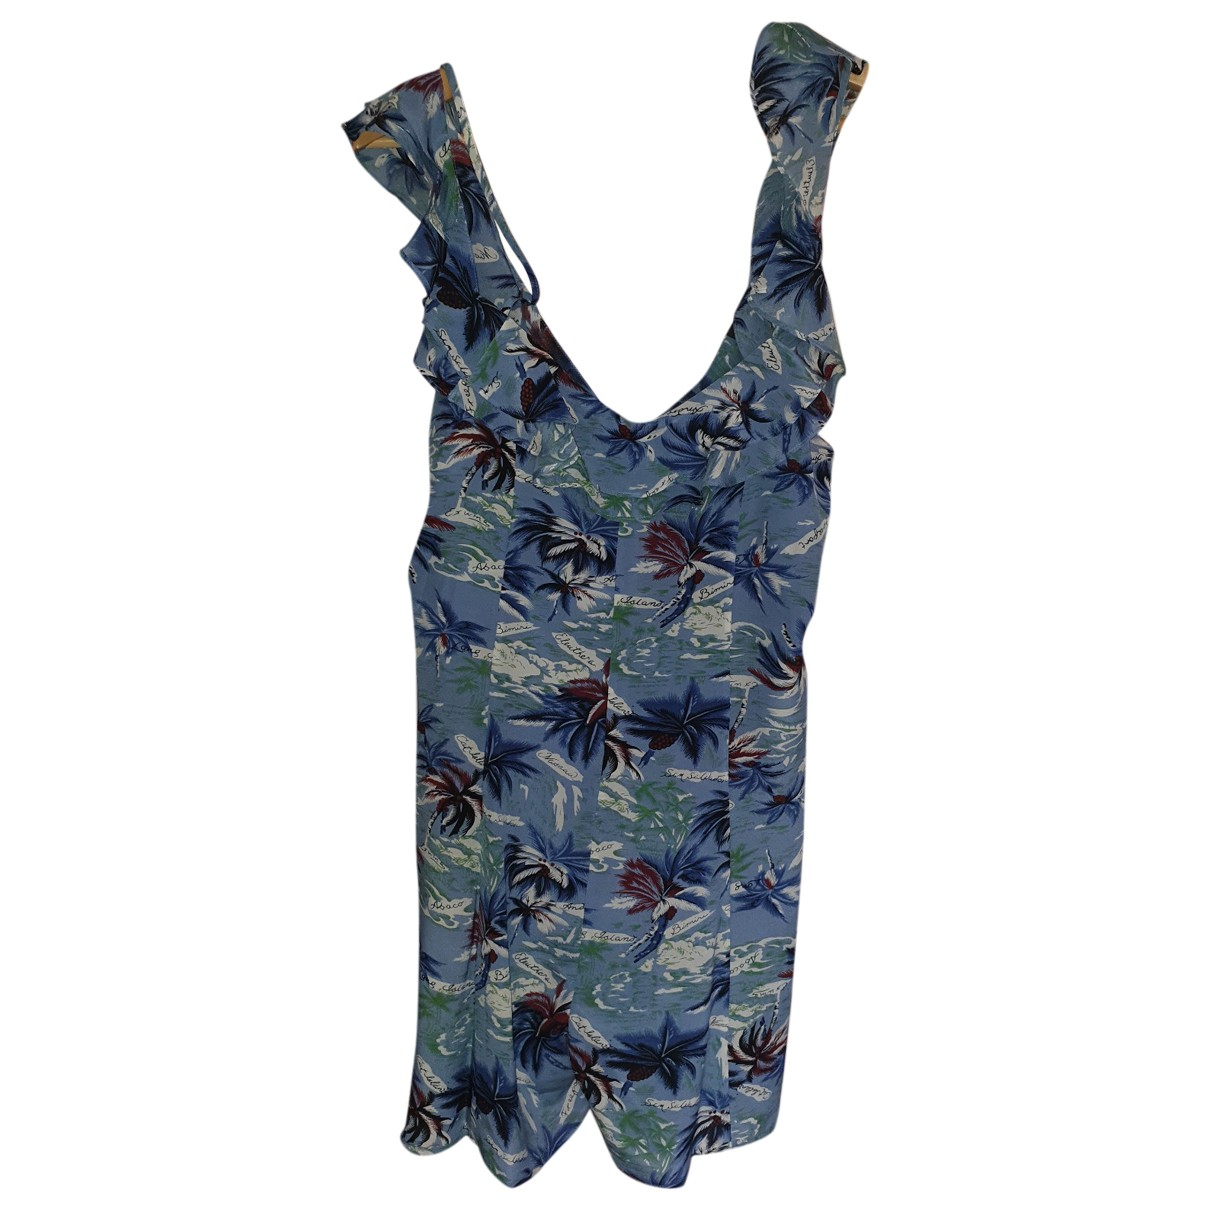 The Kooples Spring Summer 2020 Blue Cotton dress for Women 2 0-5